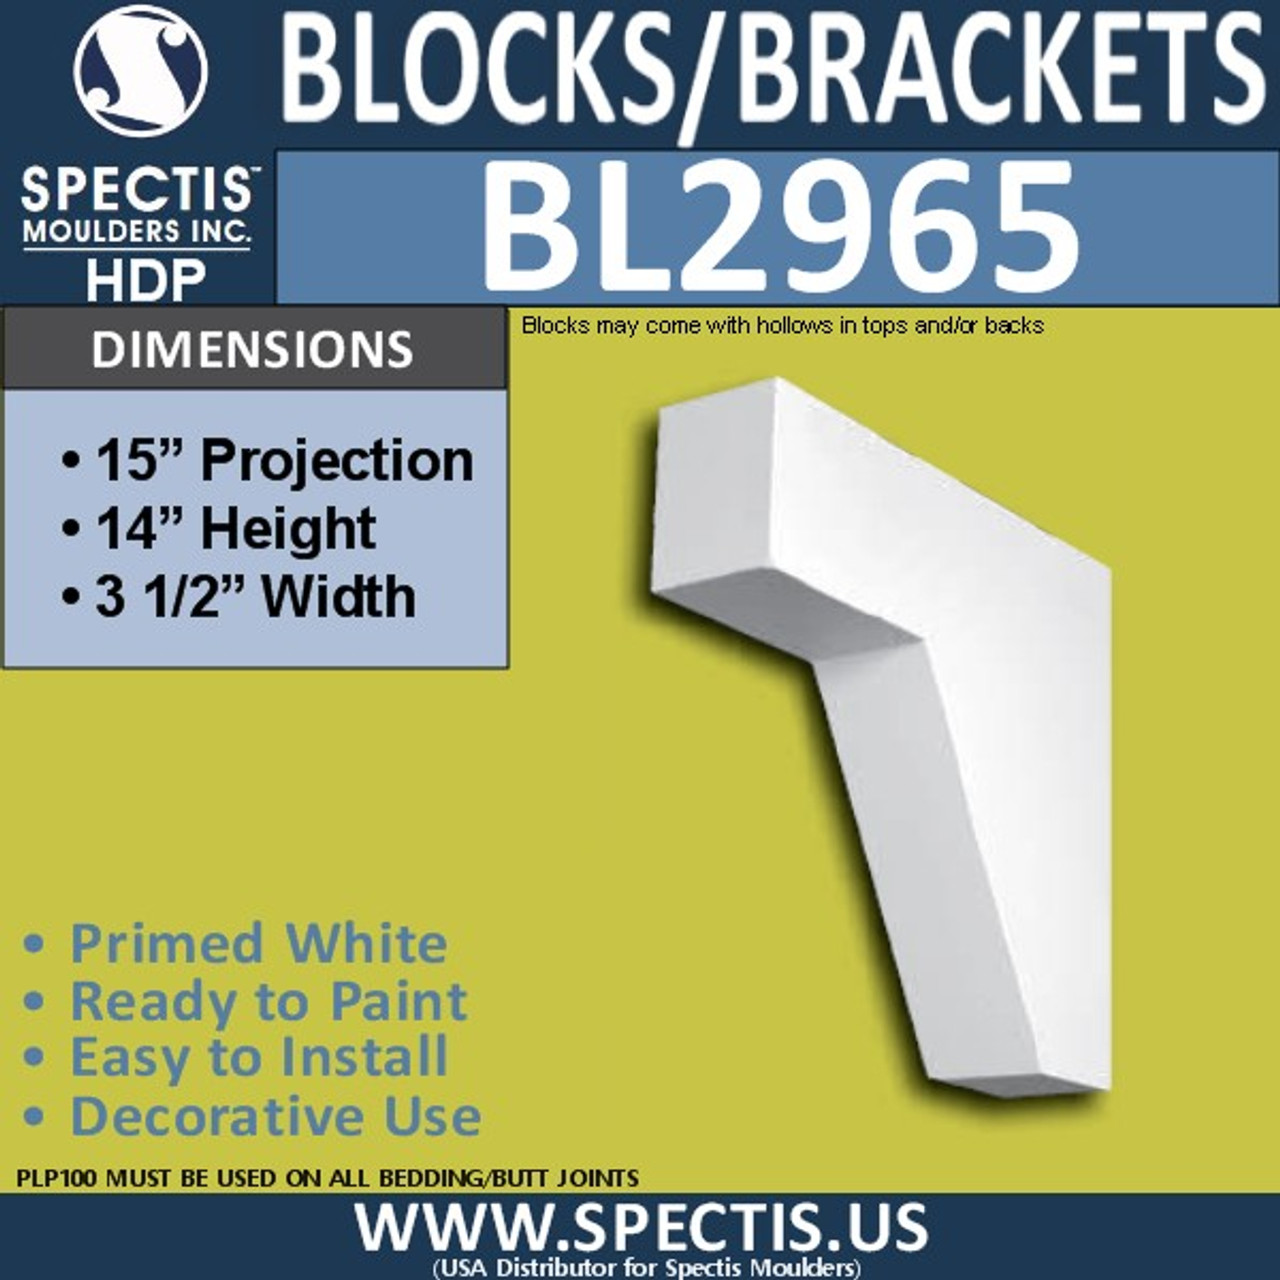 "BL2965 Eave Block or Bracket 3.5""W x 14""H x 15"" P"